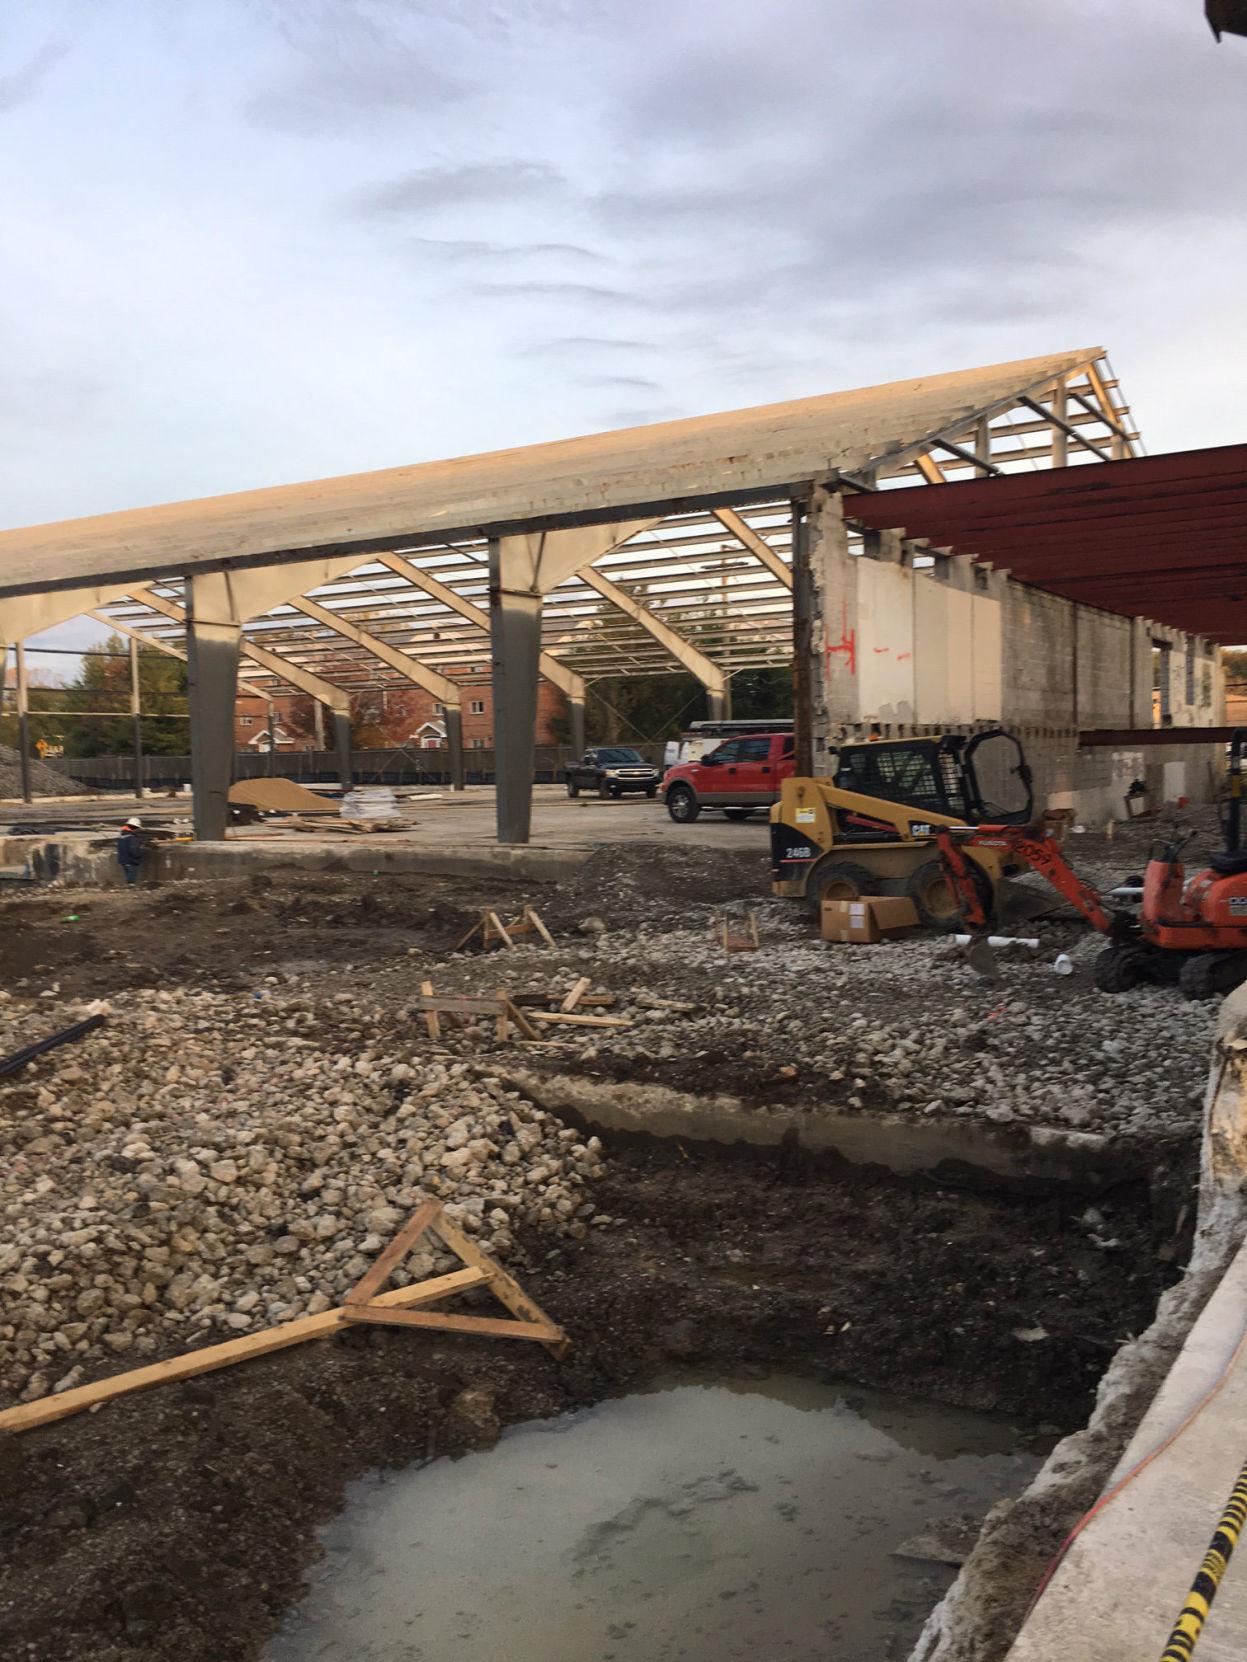 Niles Park Dist  Caldwell Building Skeleton | Journal